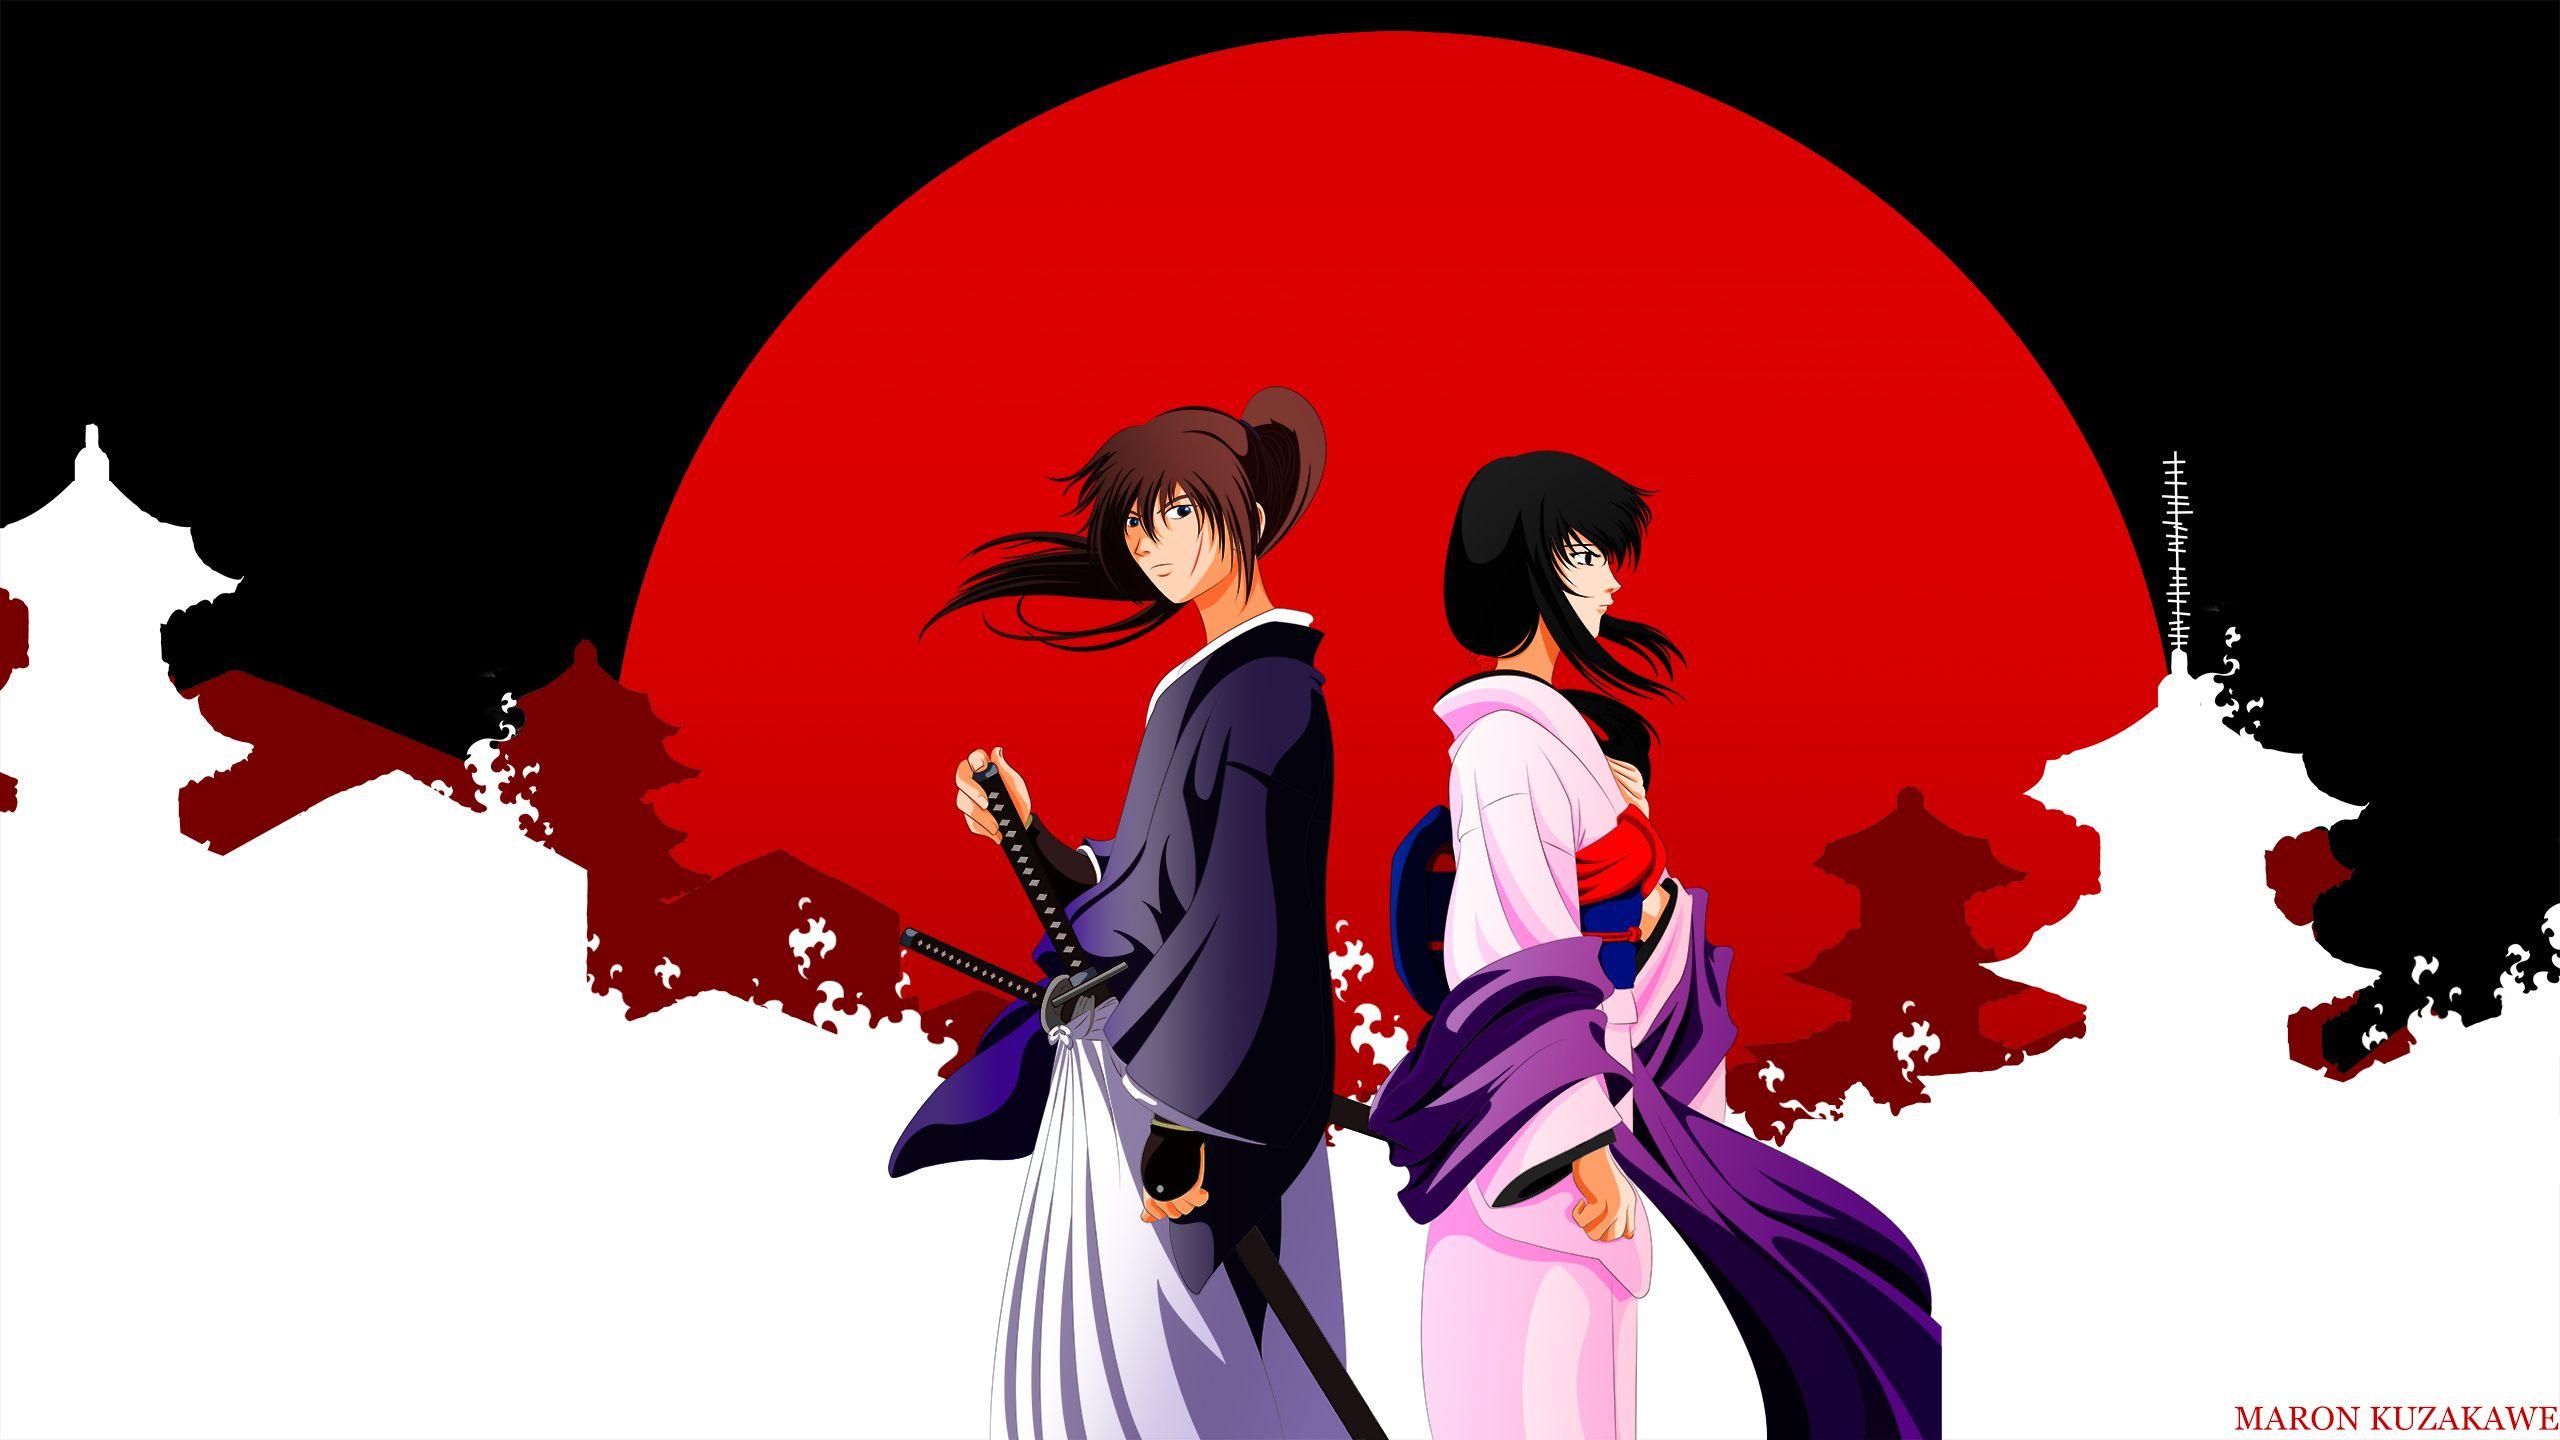 Download Rurouni Kenshin Wallpaper In Memories 2560x1440 Rurouni Kenshin Samurai Artwork Anime Download wallpaper anime samurai x